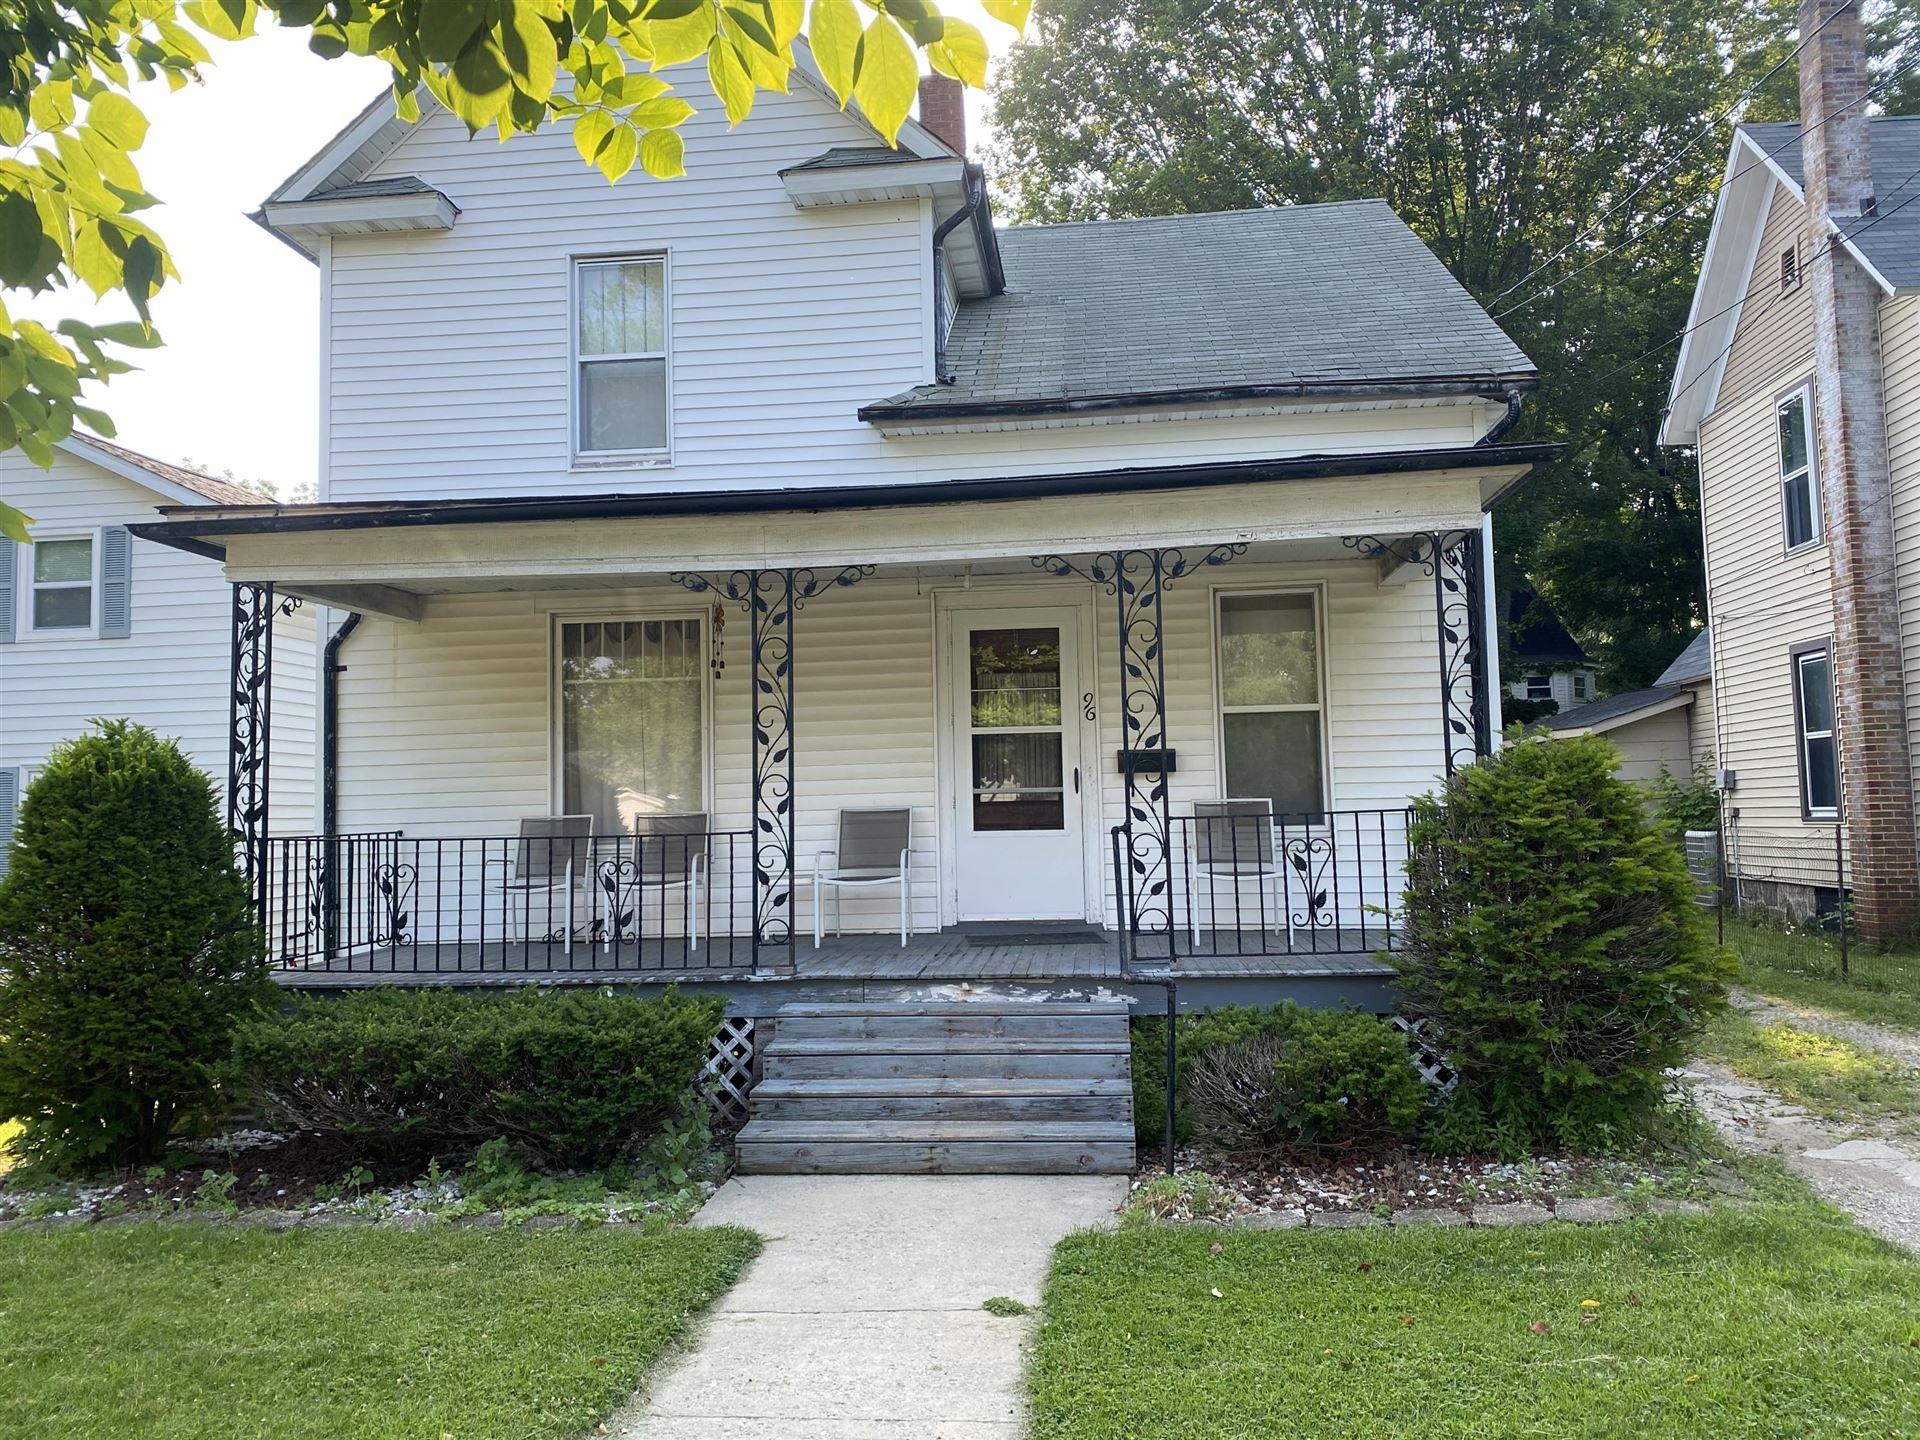 96 Morse Street, Coldwater, MI 49036 - MLS#: 21026313